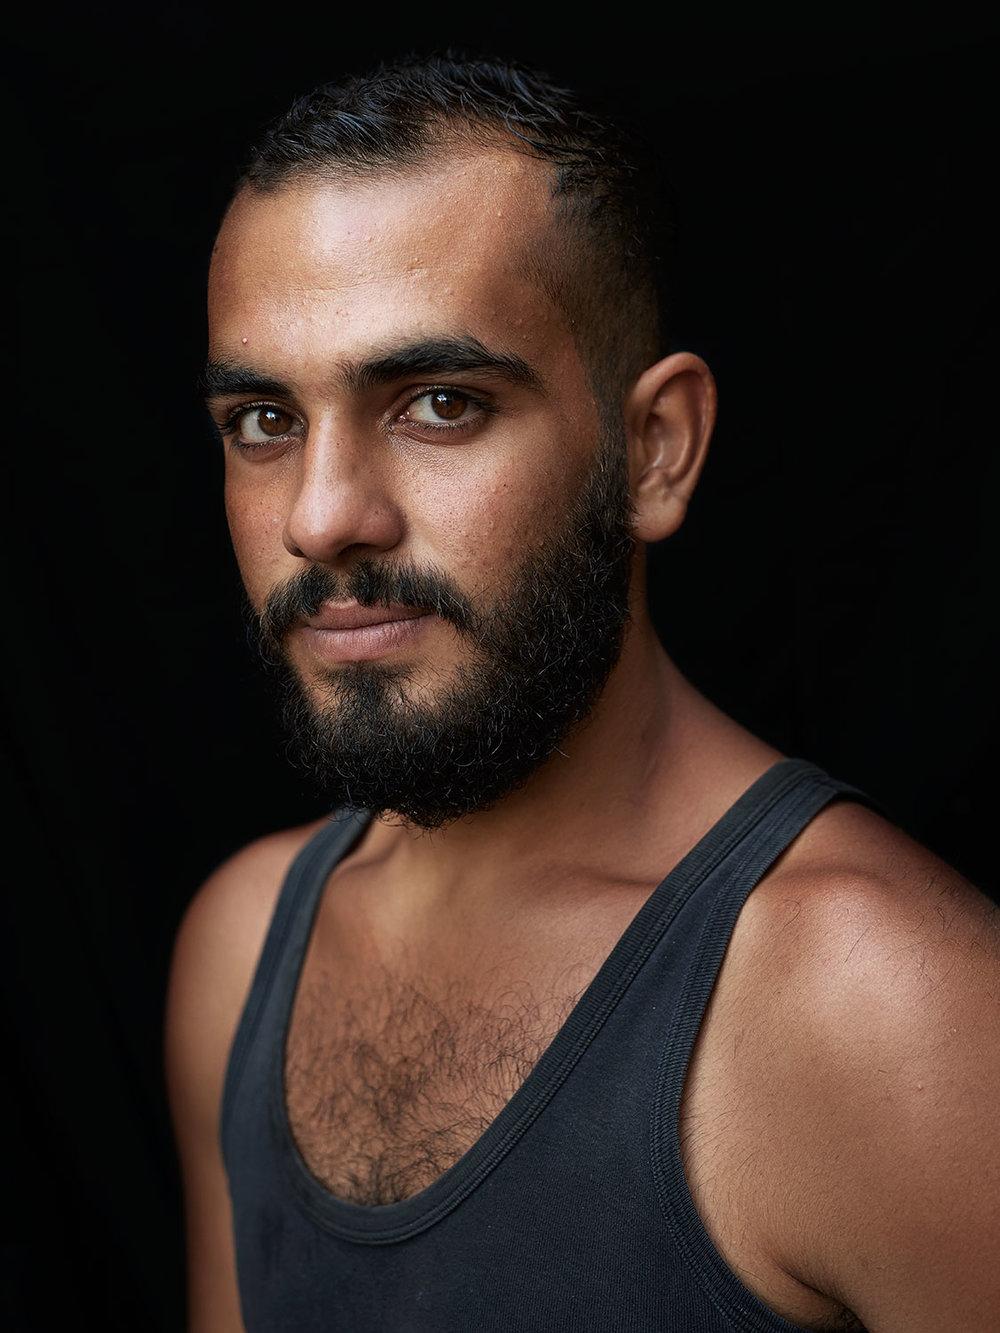 Ahmad /  Syria / Refugee / Was a barber in Syria / Chios, Greece /